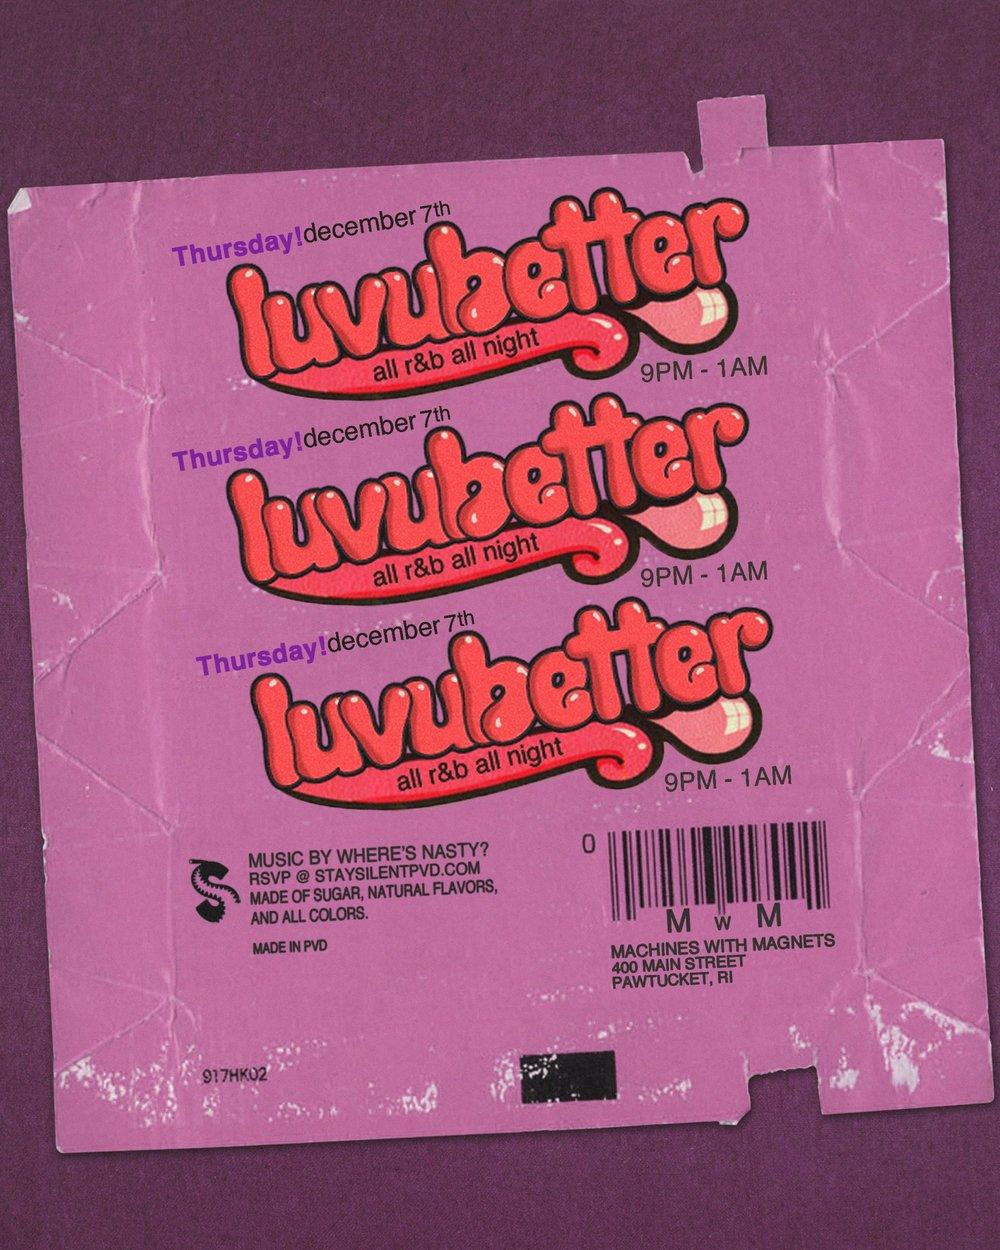 LUVUBETTER-MWM.jpg.jpeg